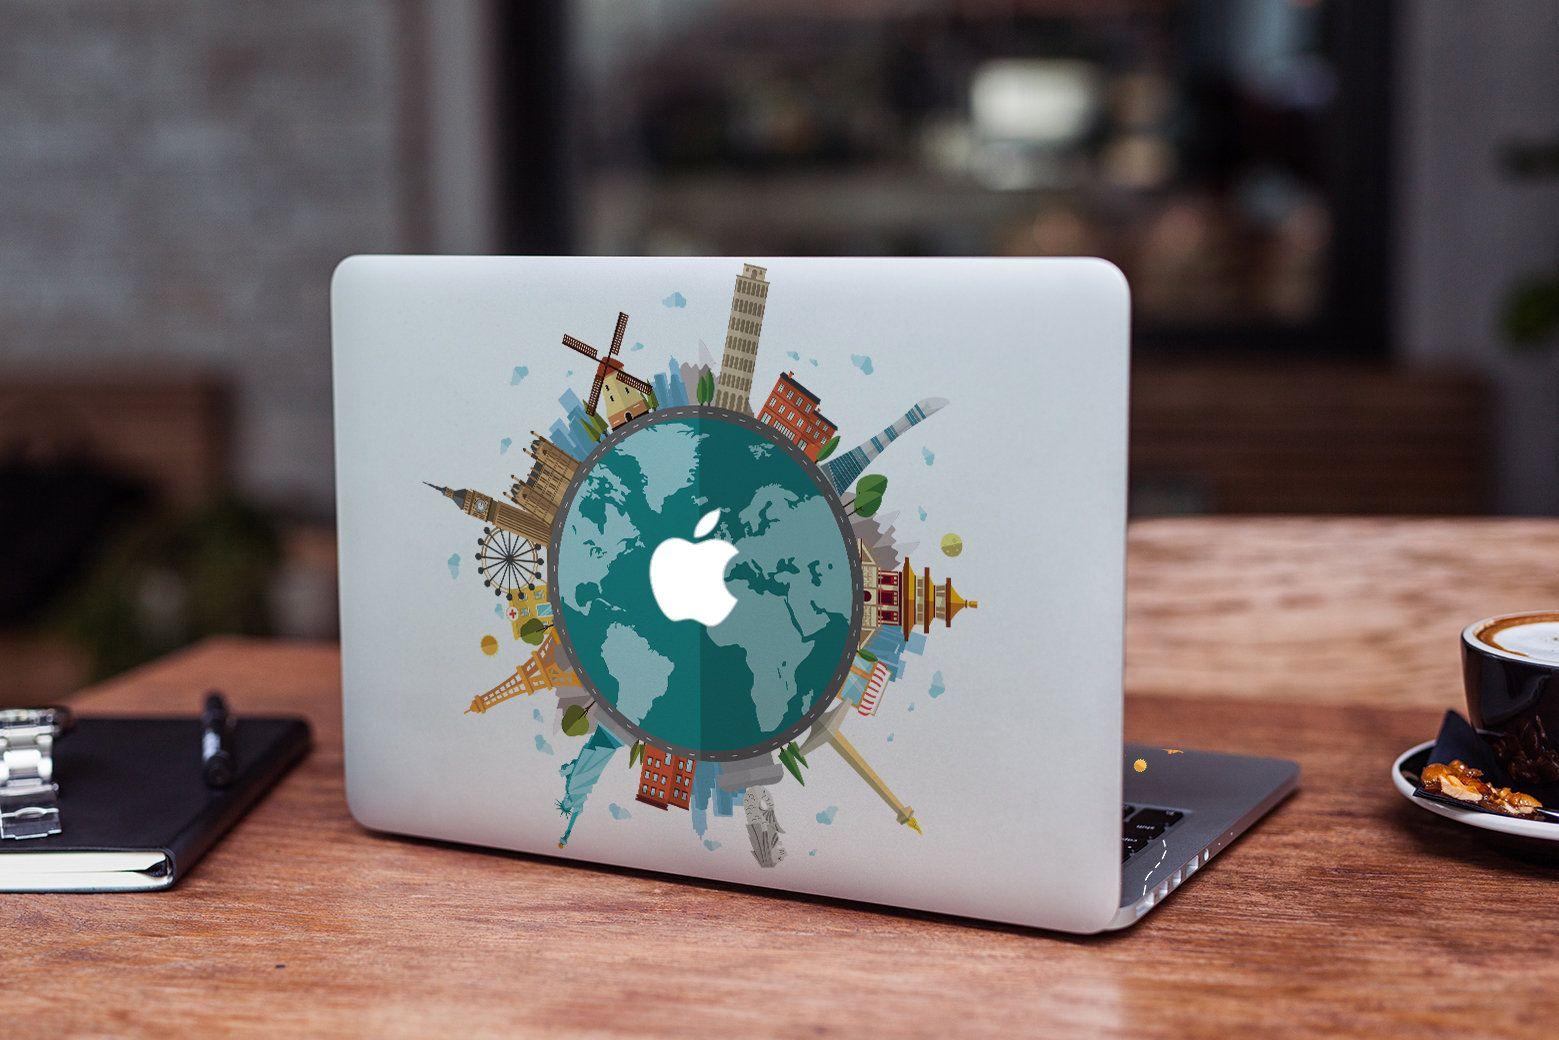 Macbook Pro 13 Around the World Skin Macbook 2016 Decal